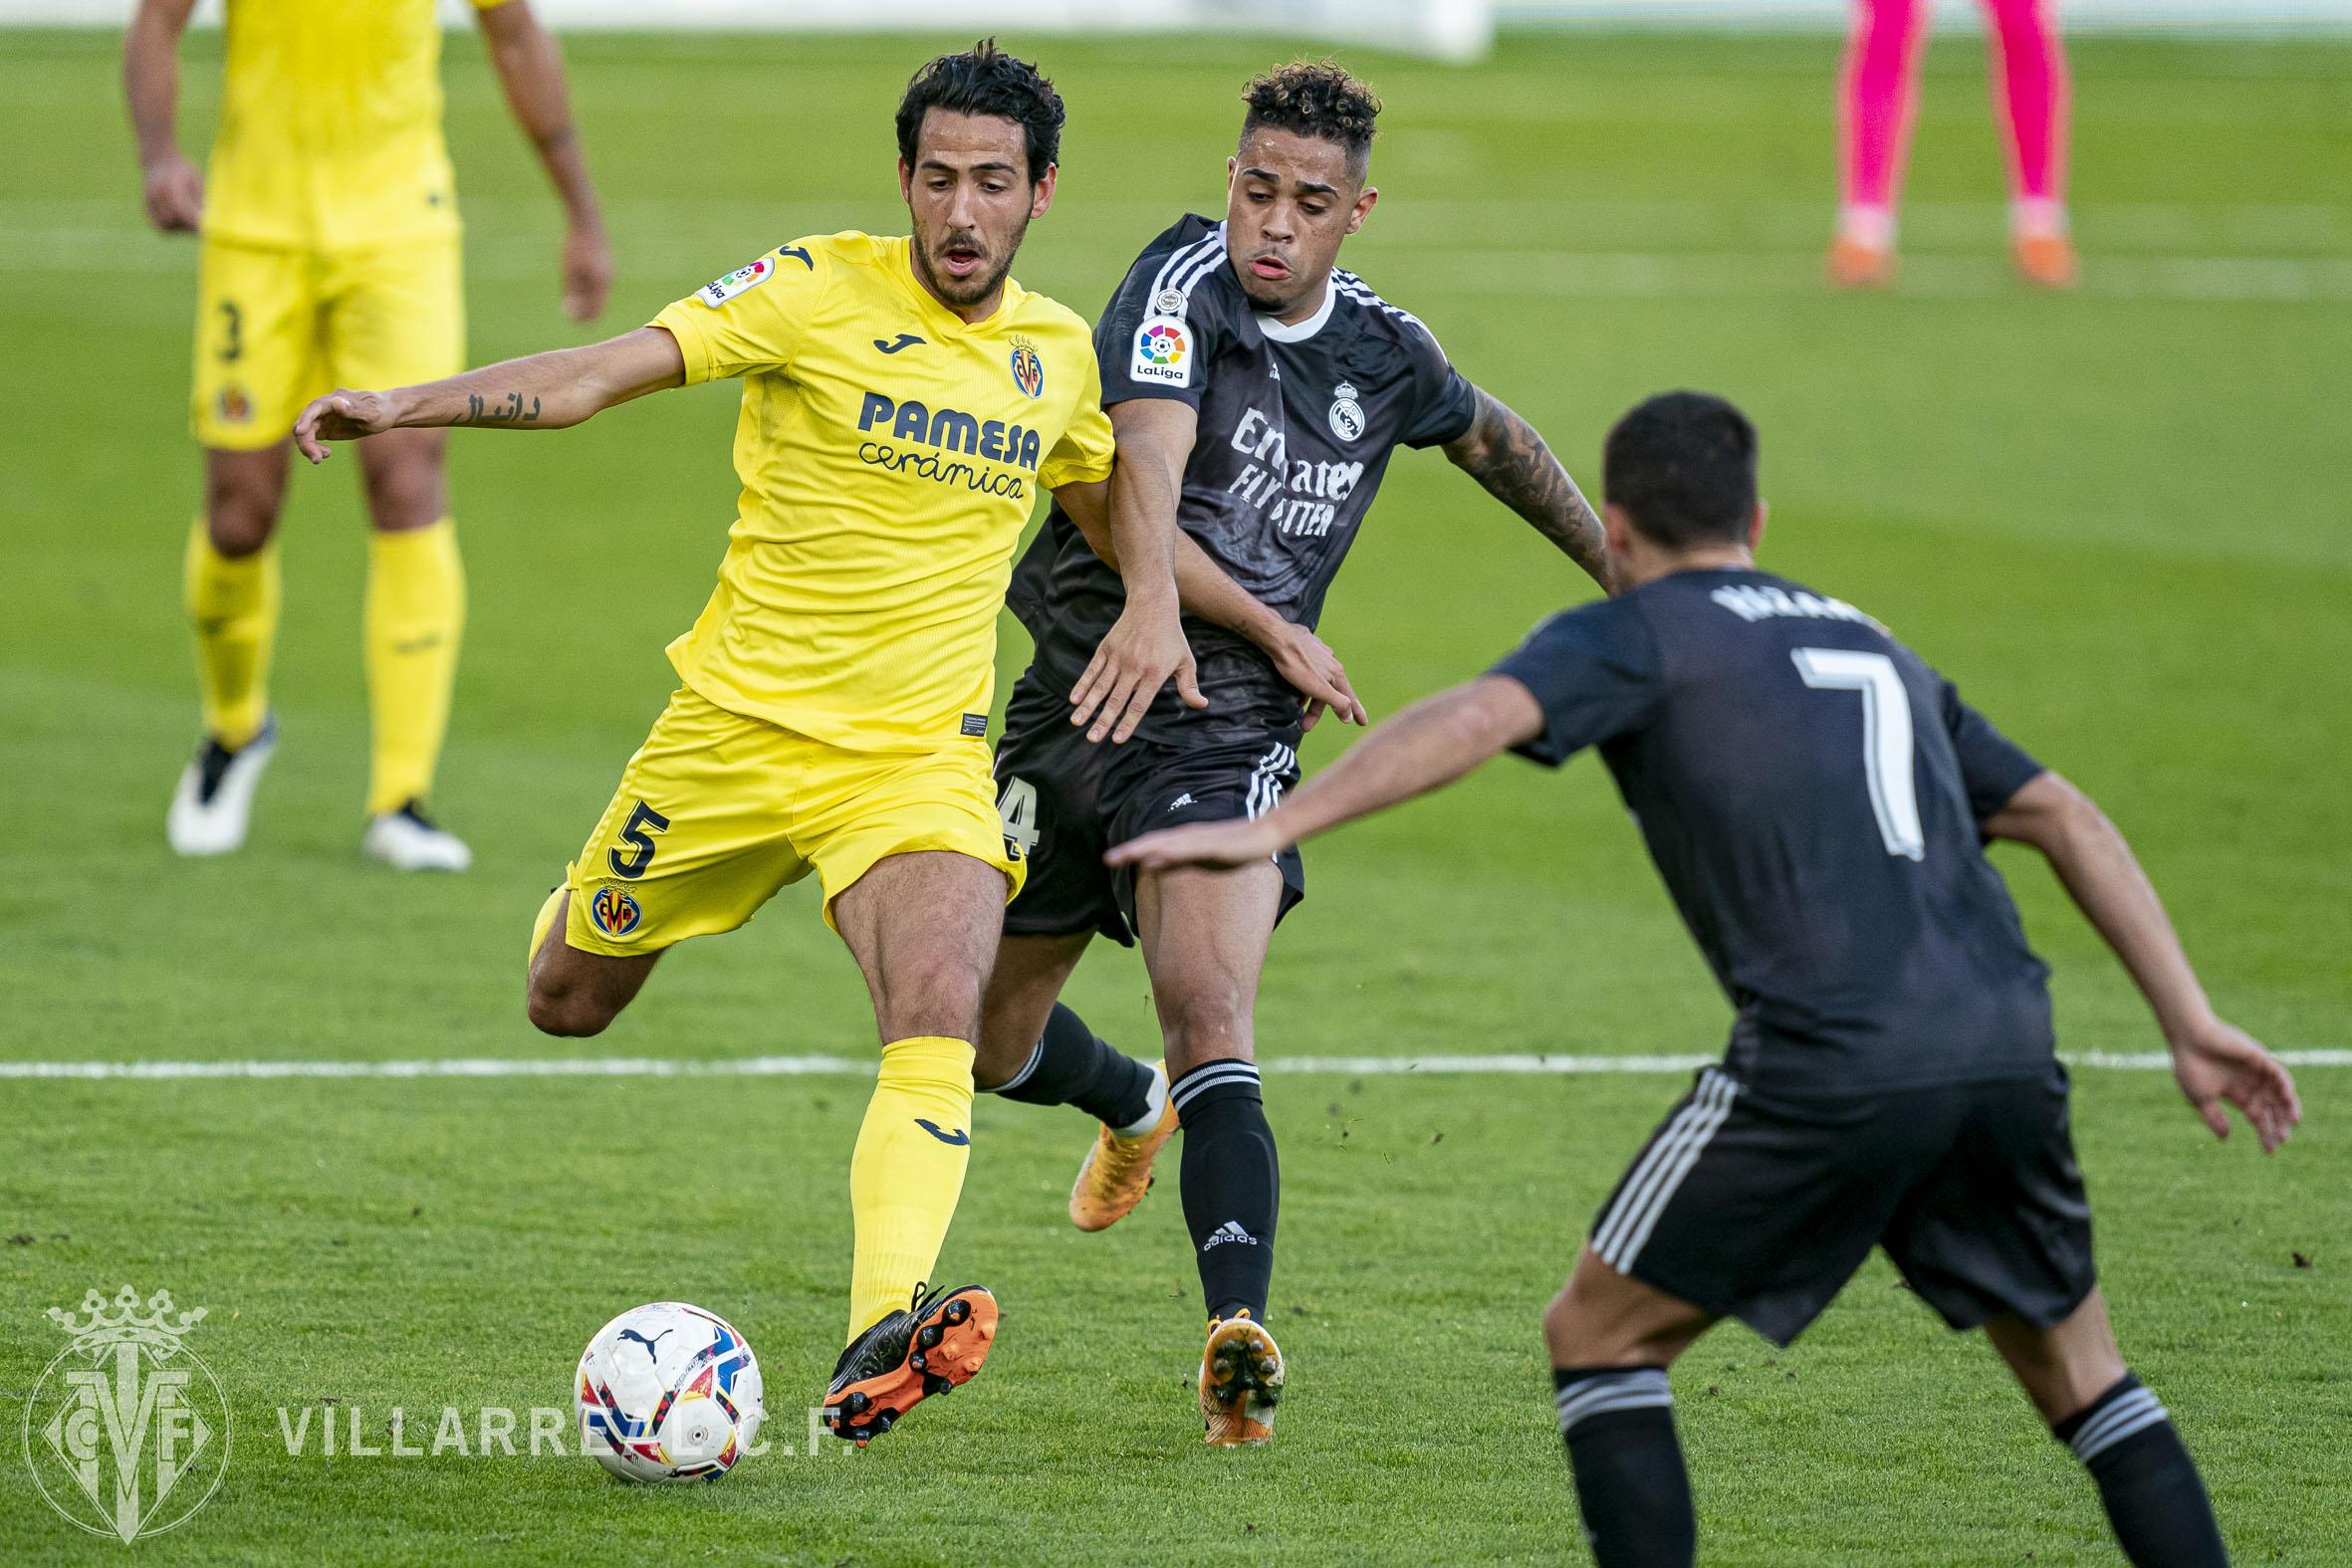 Video: Gerard Moreno equalises for Villarreal against Real Madrid